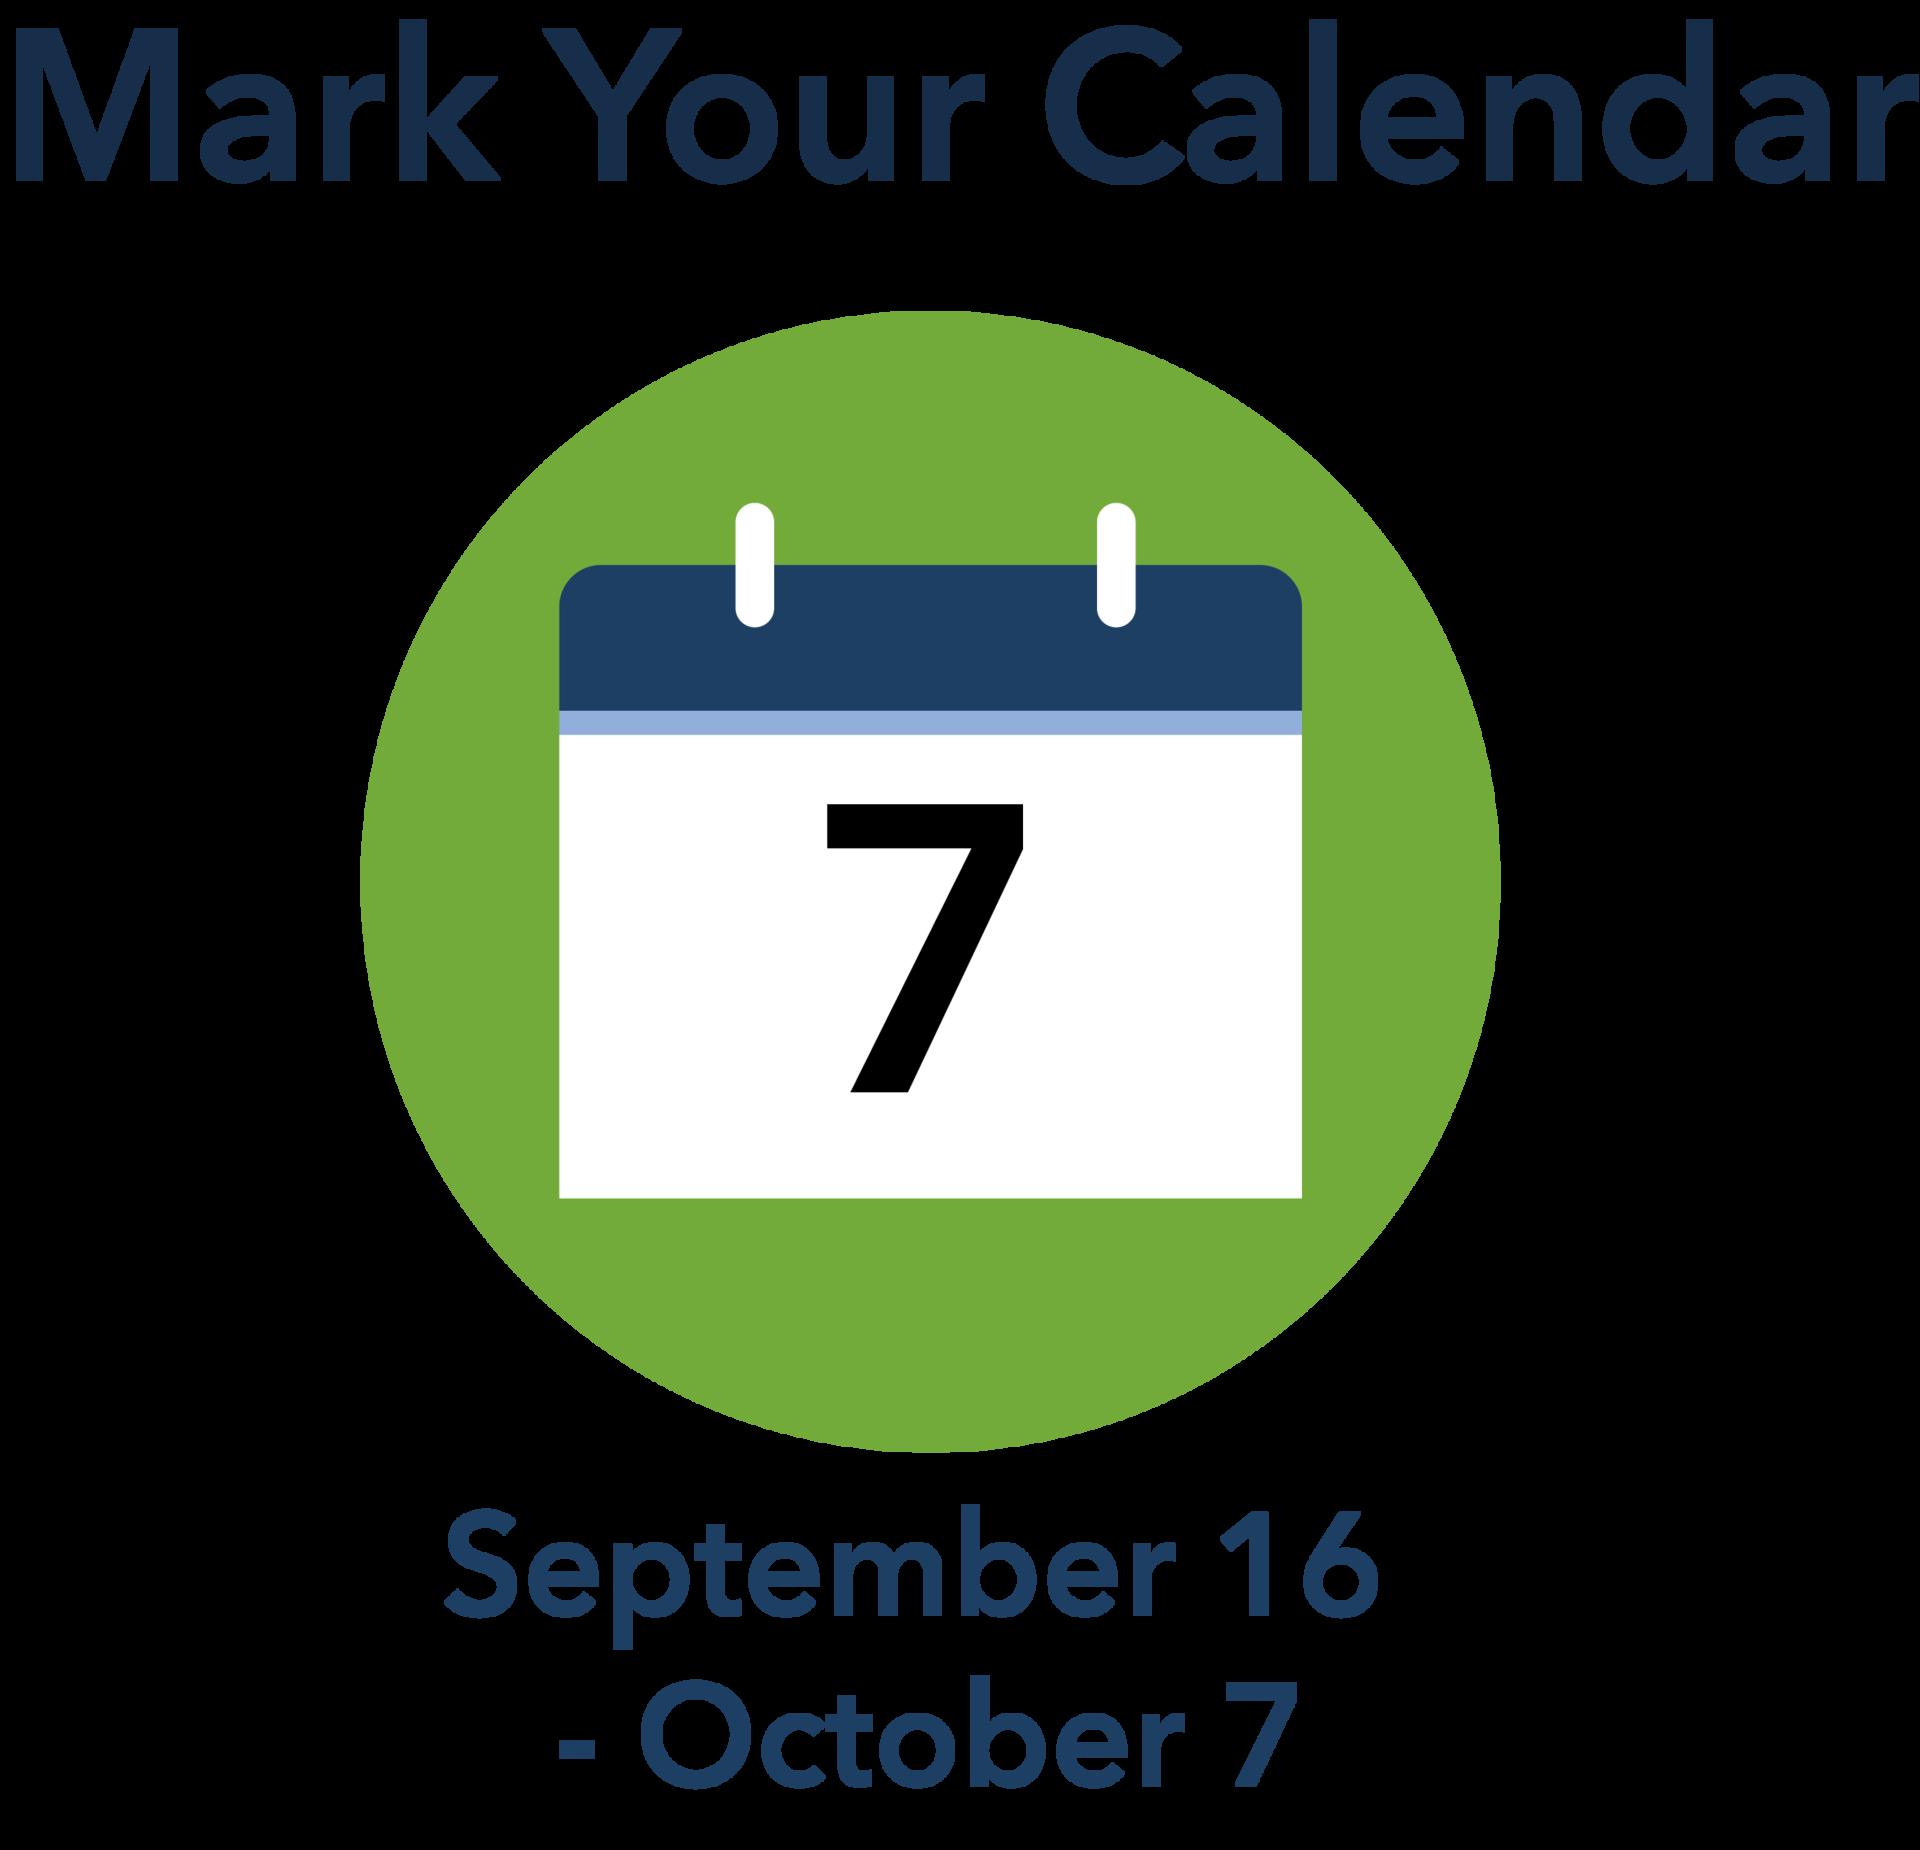 Mark Your Calendar September 16 - October 7